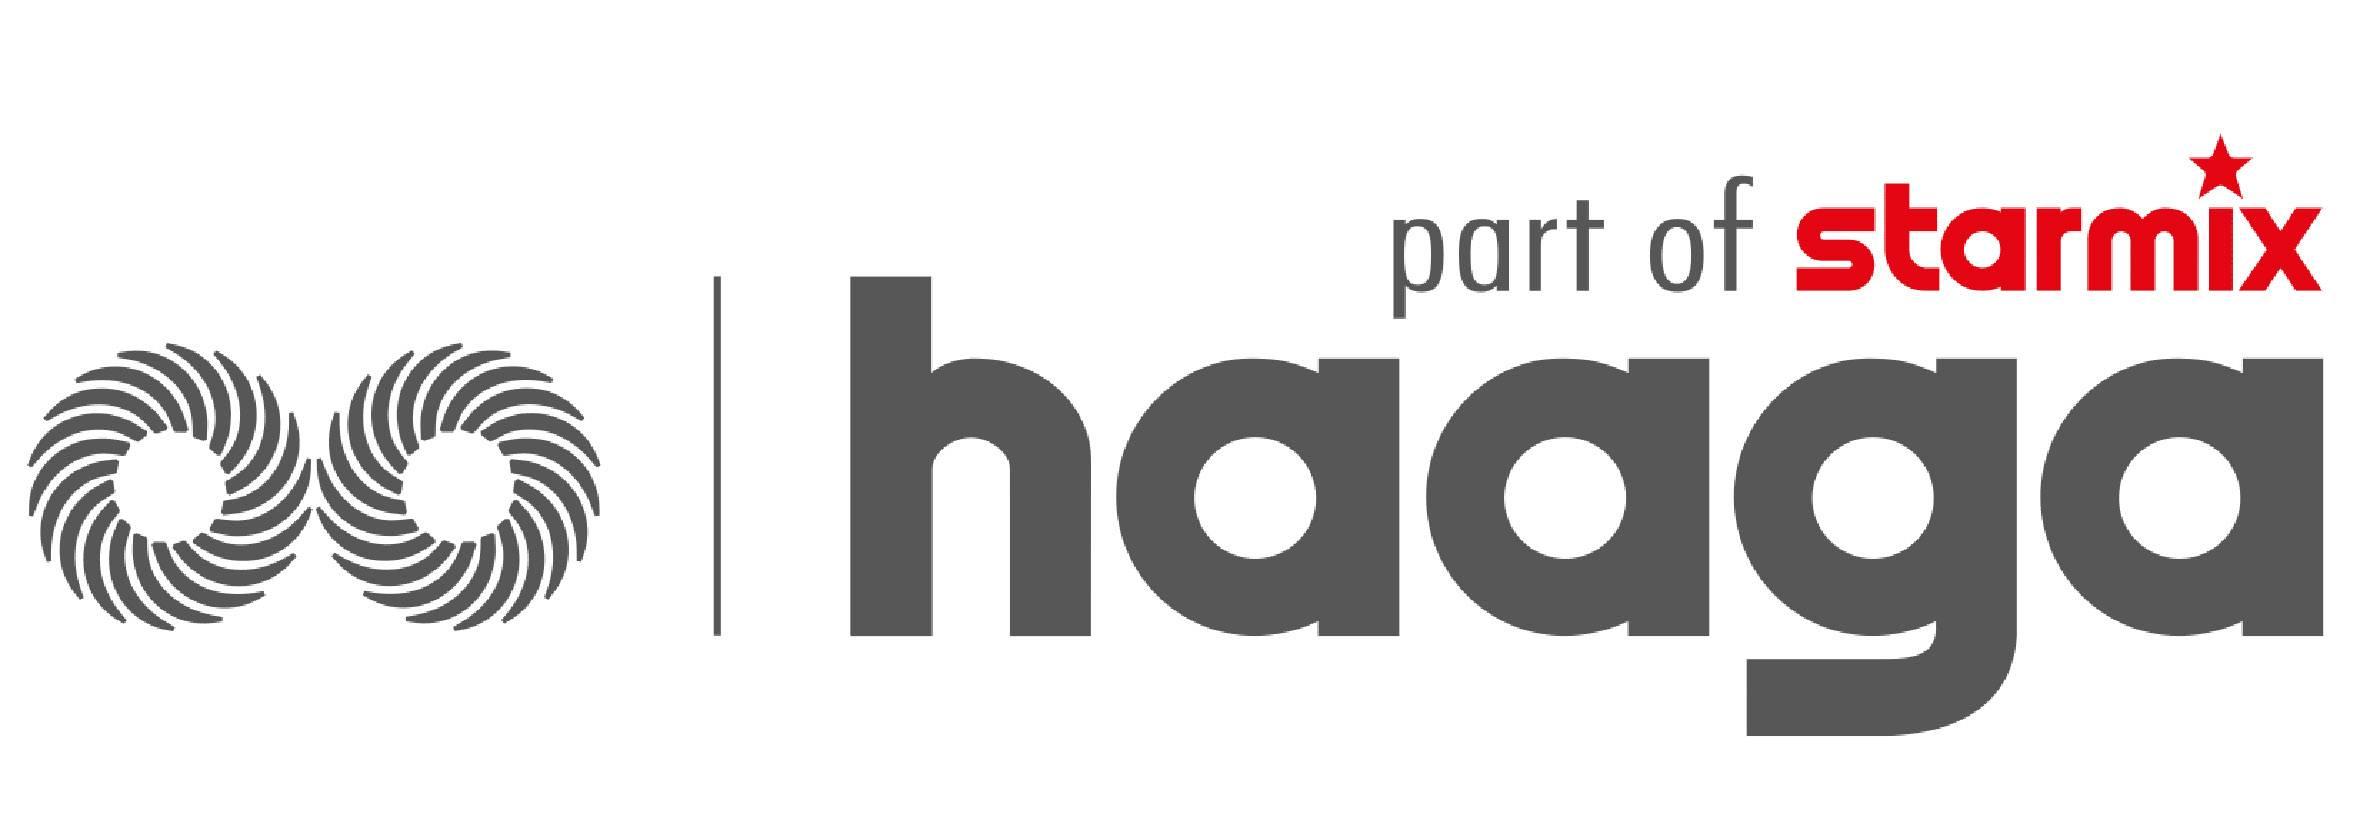 Haaga - Part of Starmix